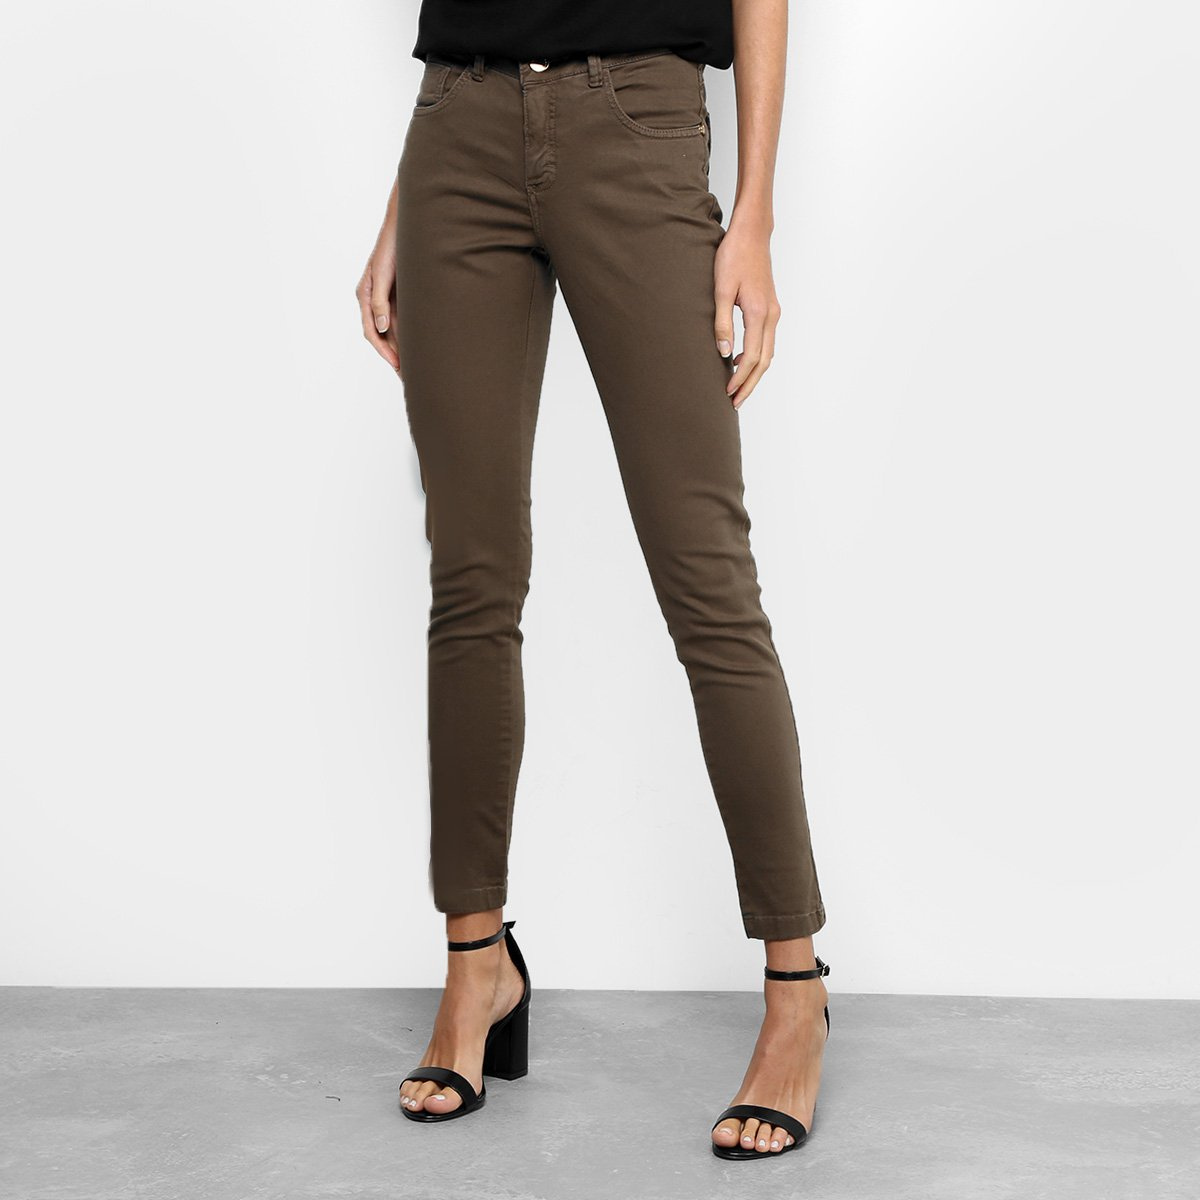 b321991d18 Calça Skinny Uber Jeans Sarja Feminina - Compre Agora